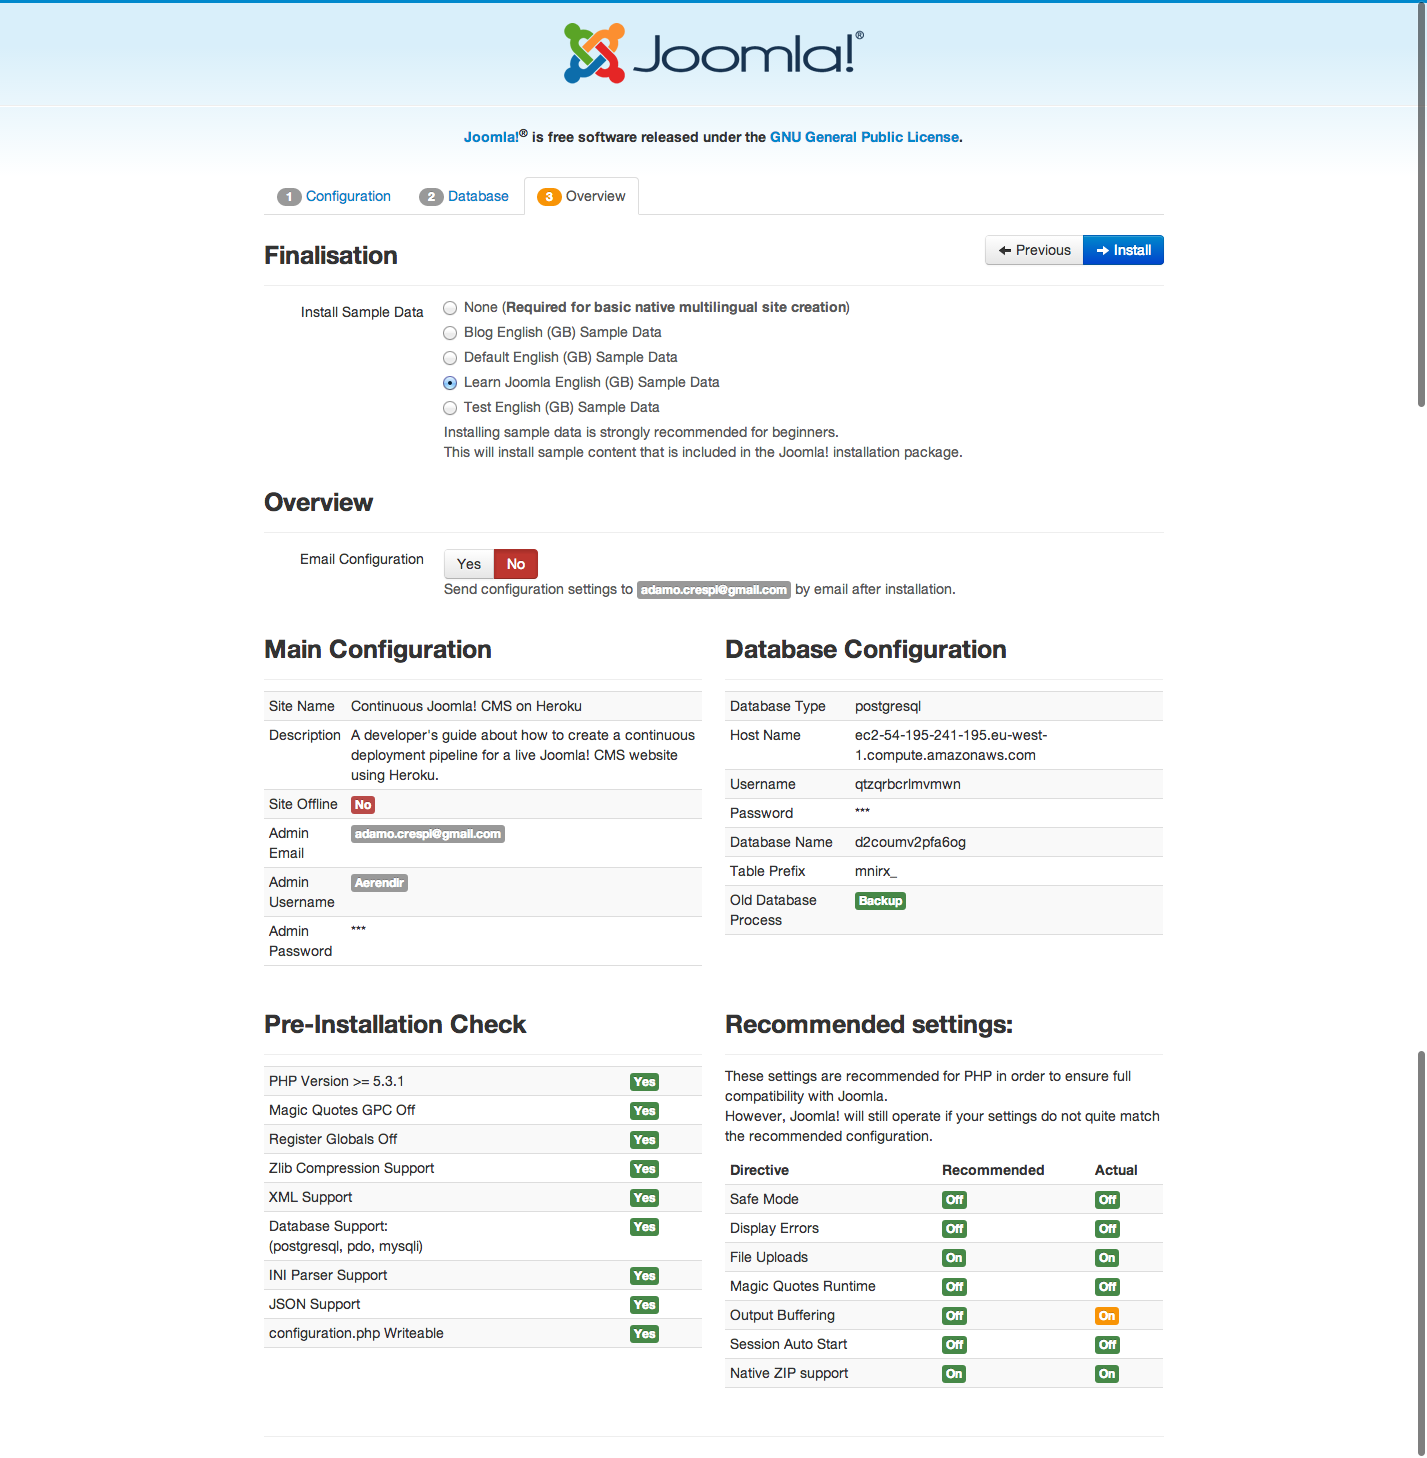 Continuous Joomla CMS on Heroku - INstallation